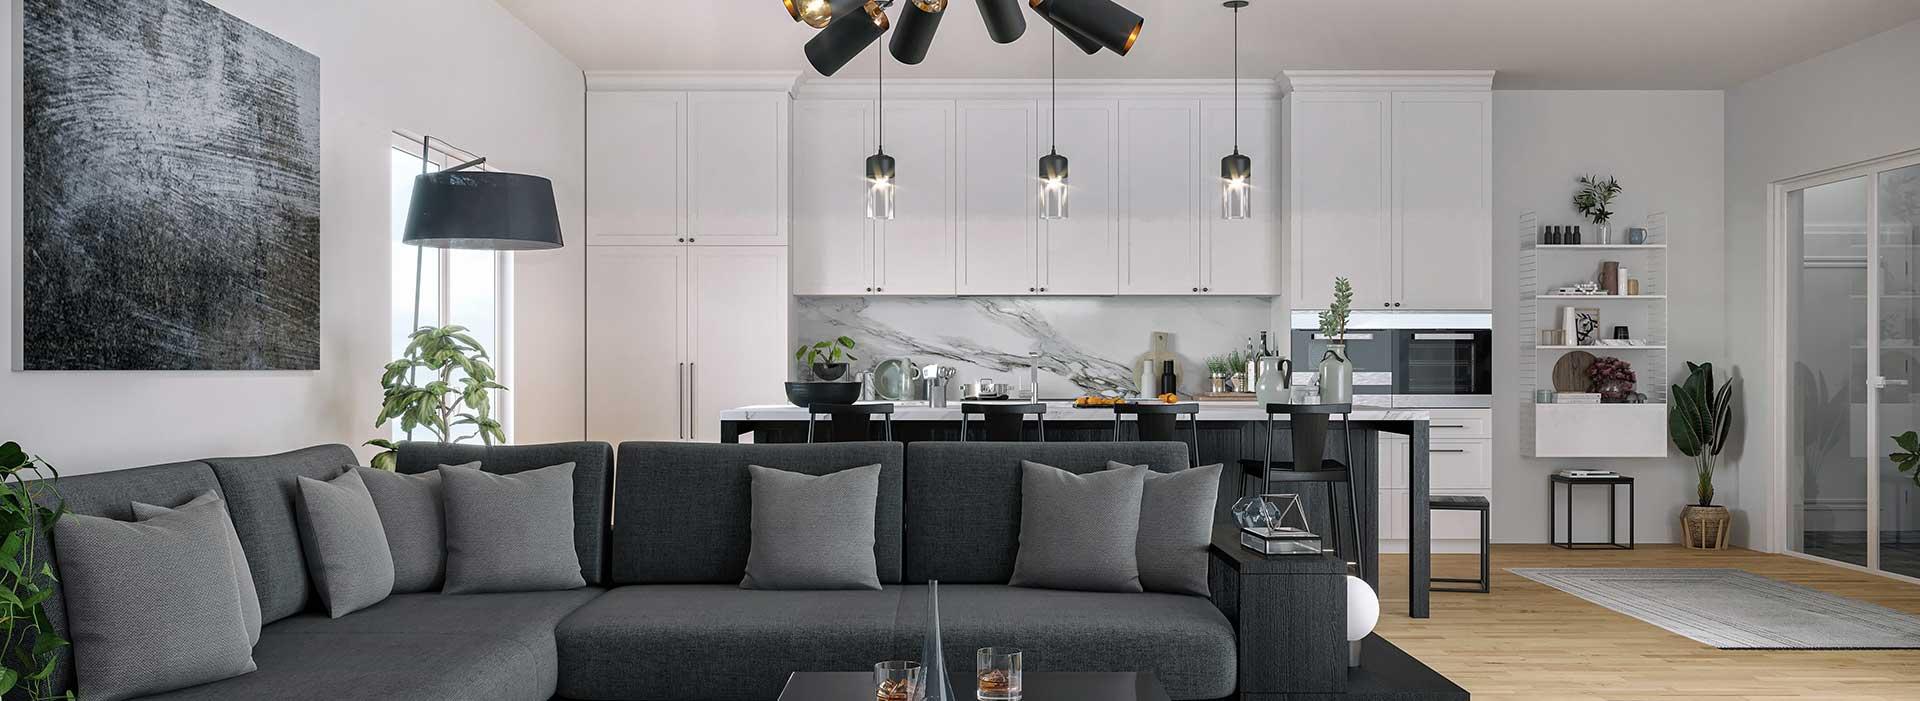 sfl custom homes great room